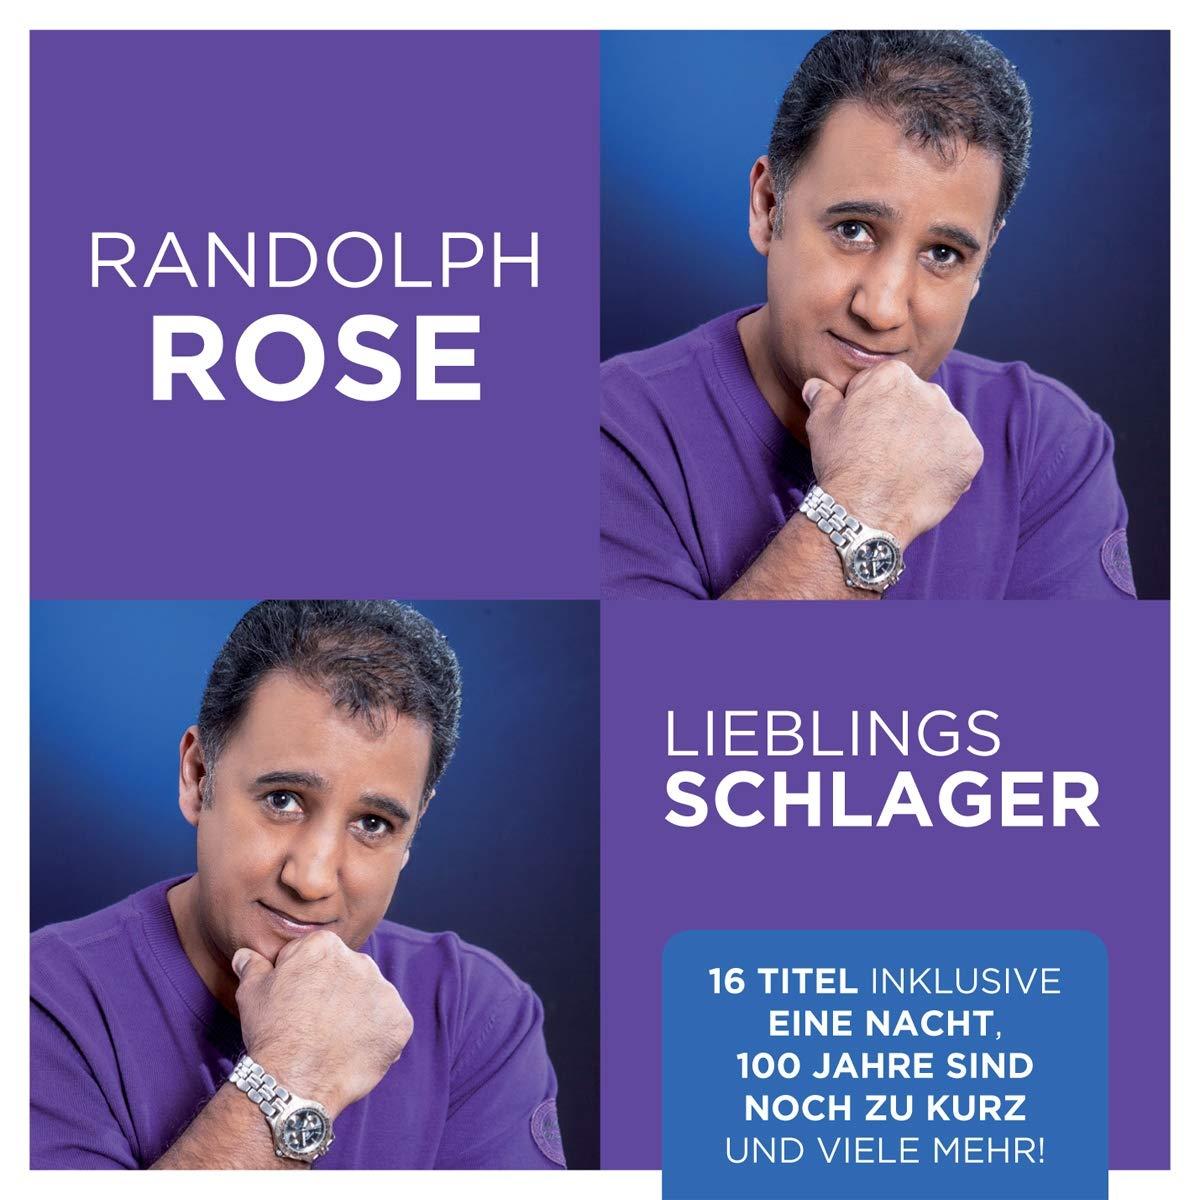 RANDOLPH ROSE – LIEBLINGSSCHLAGER